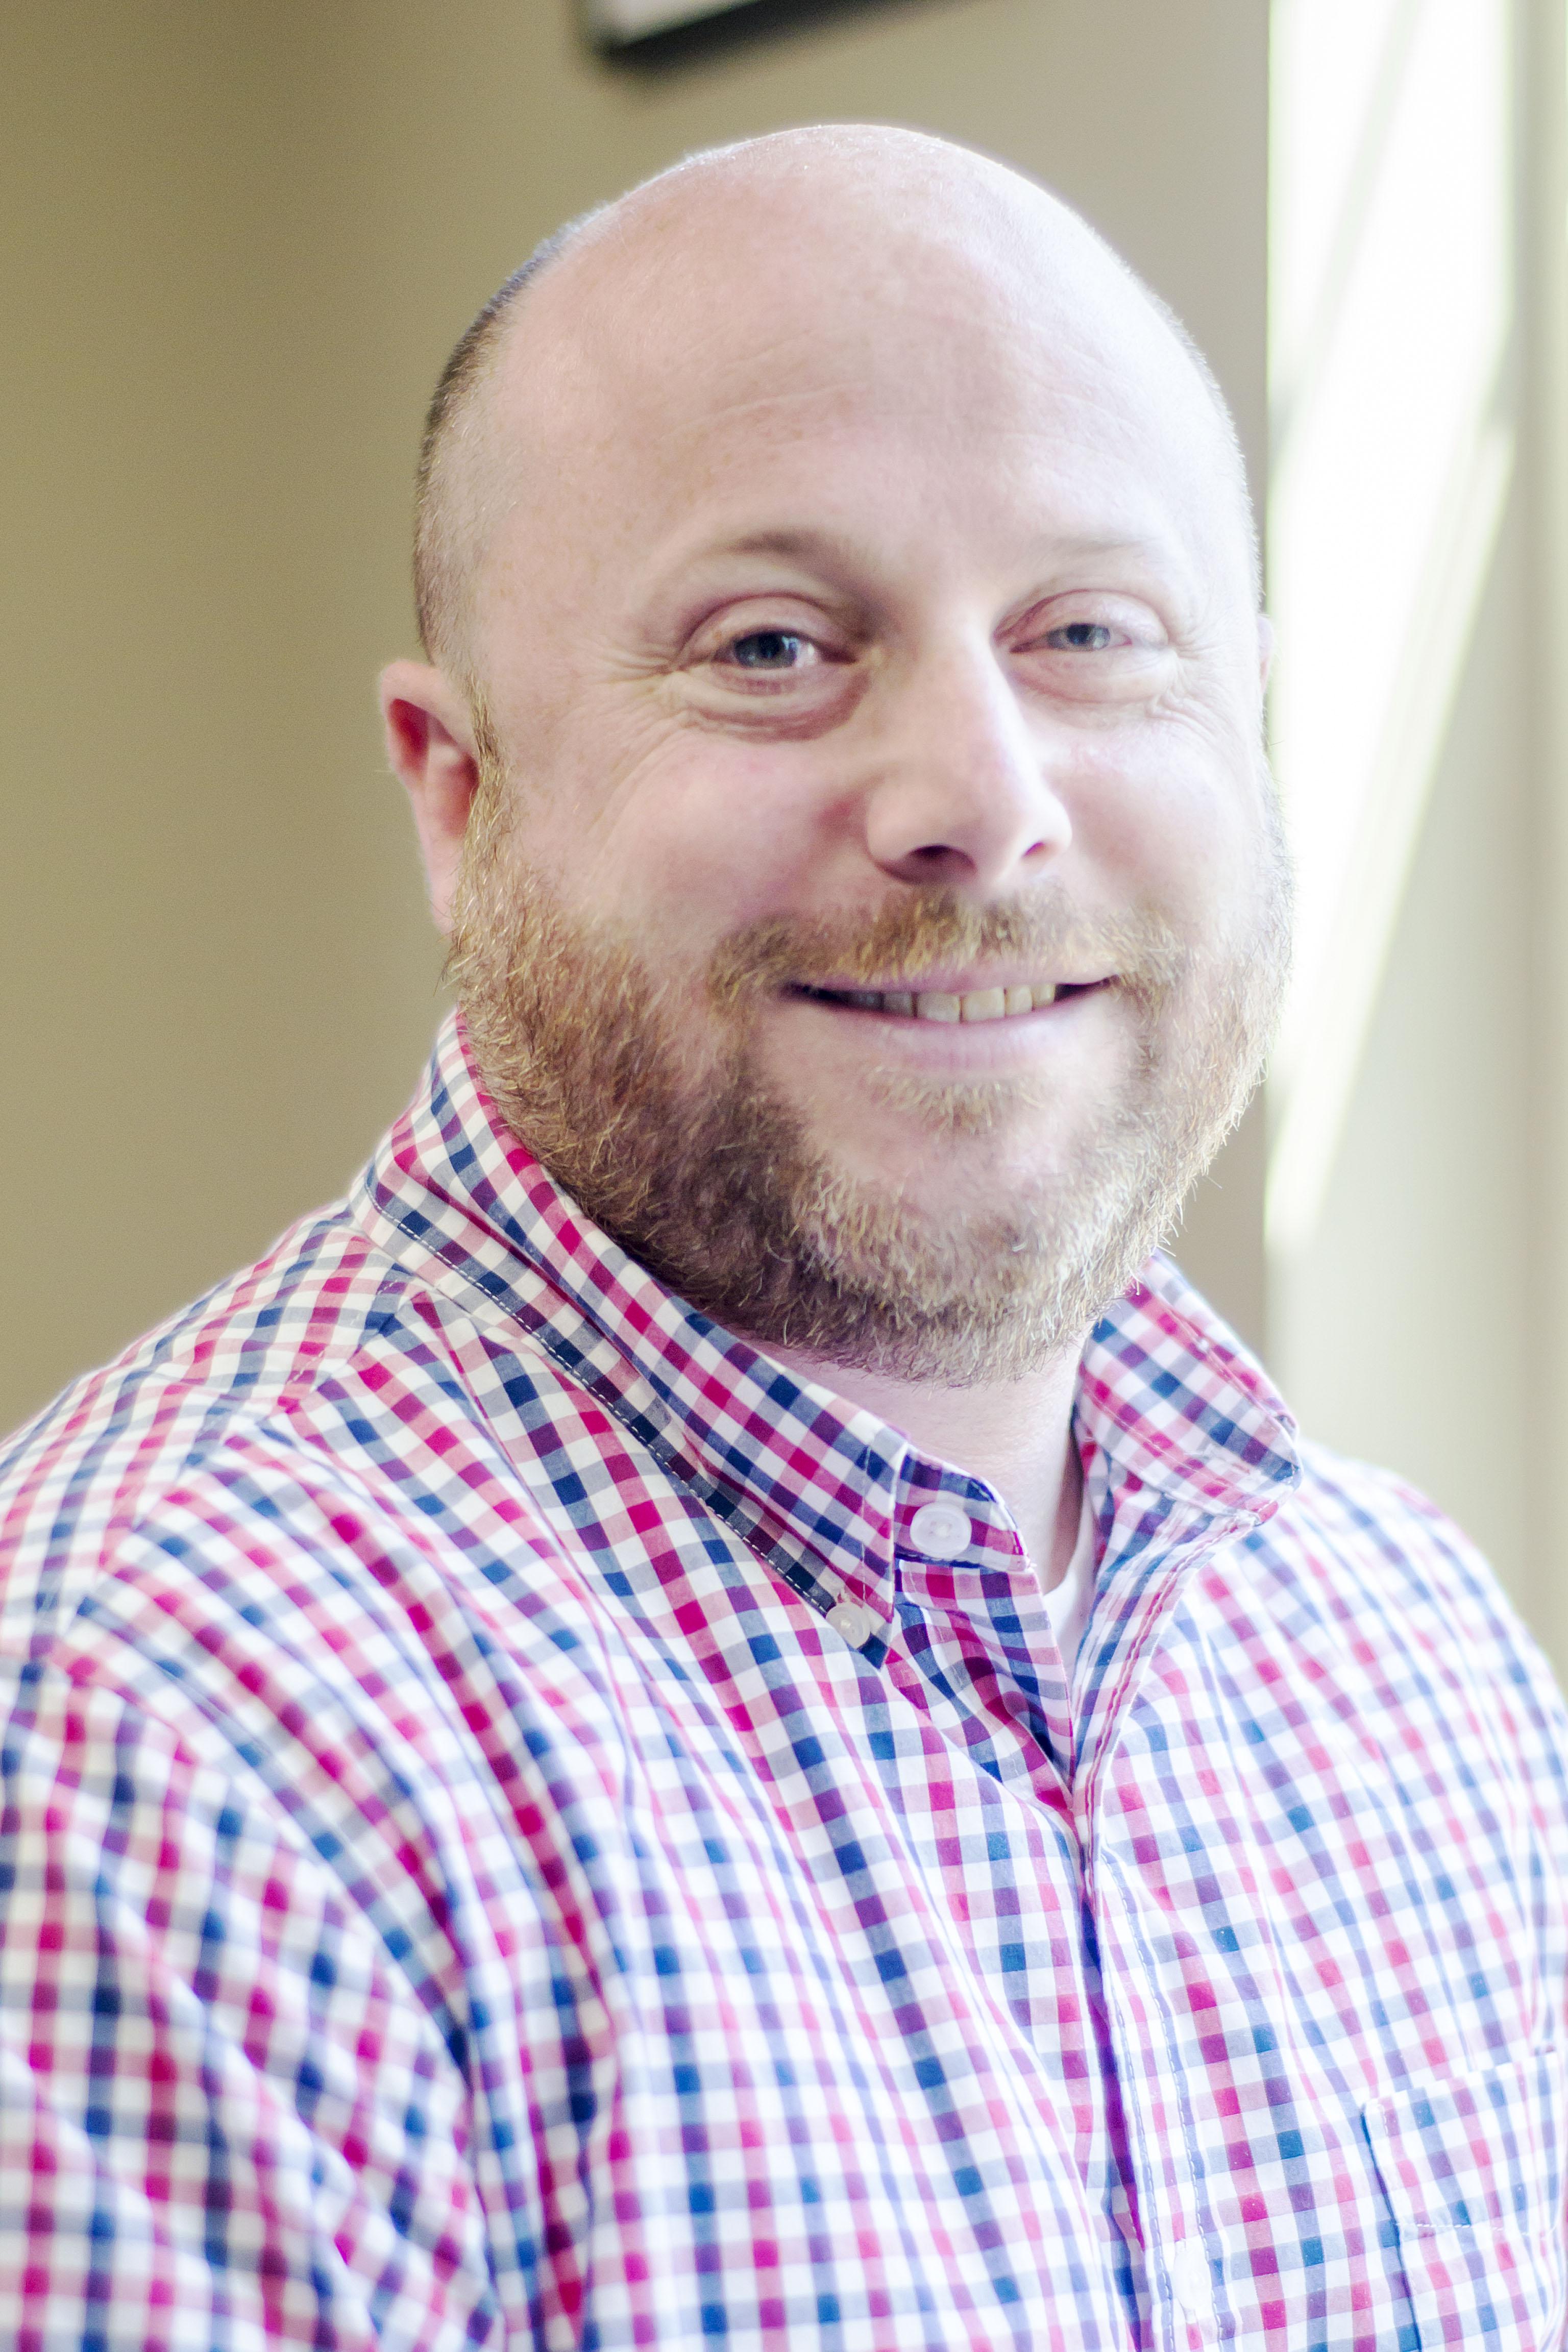 Scott Peritzman